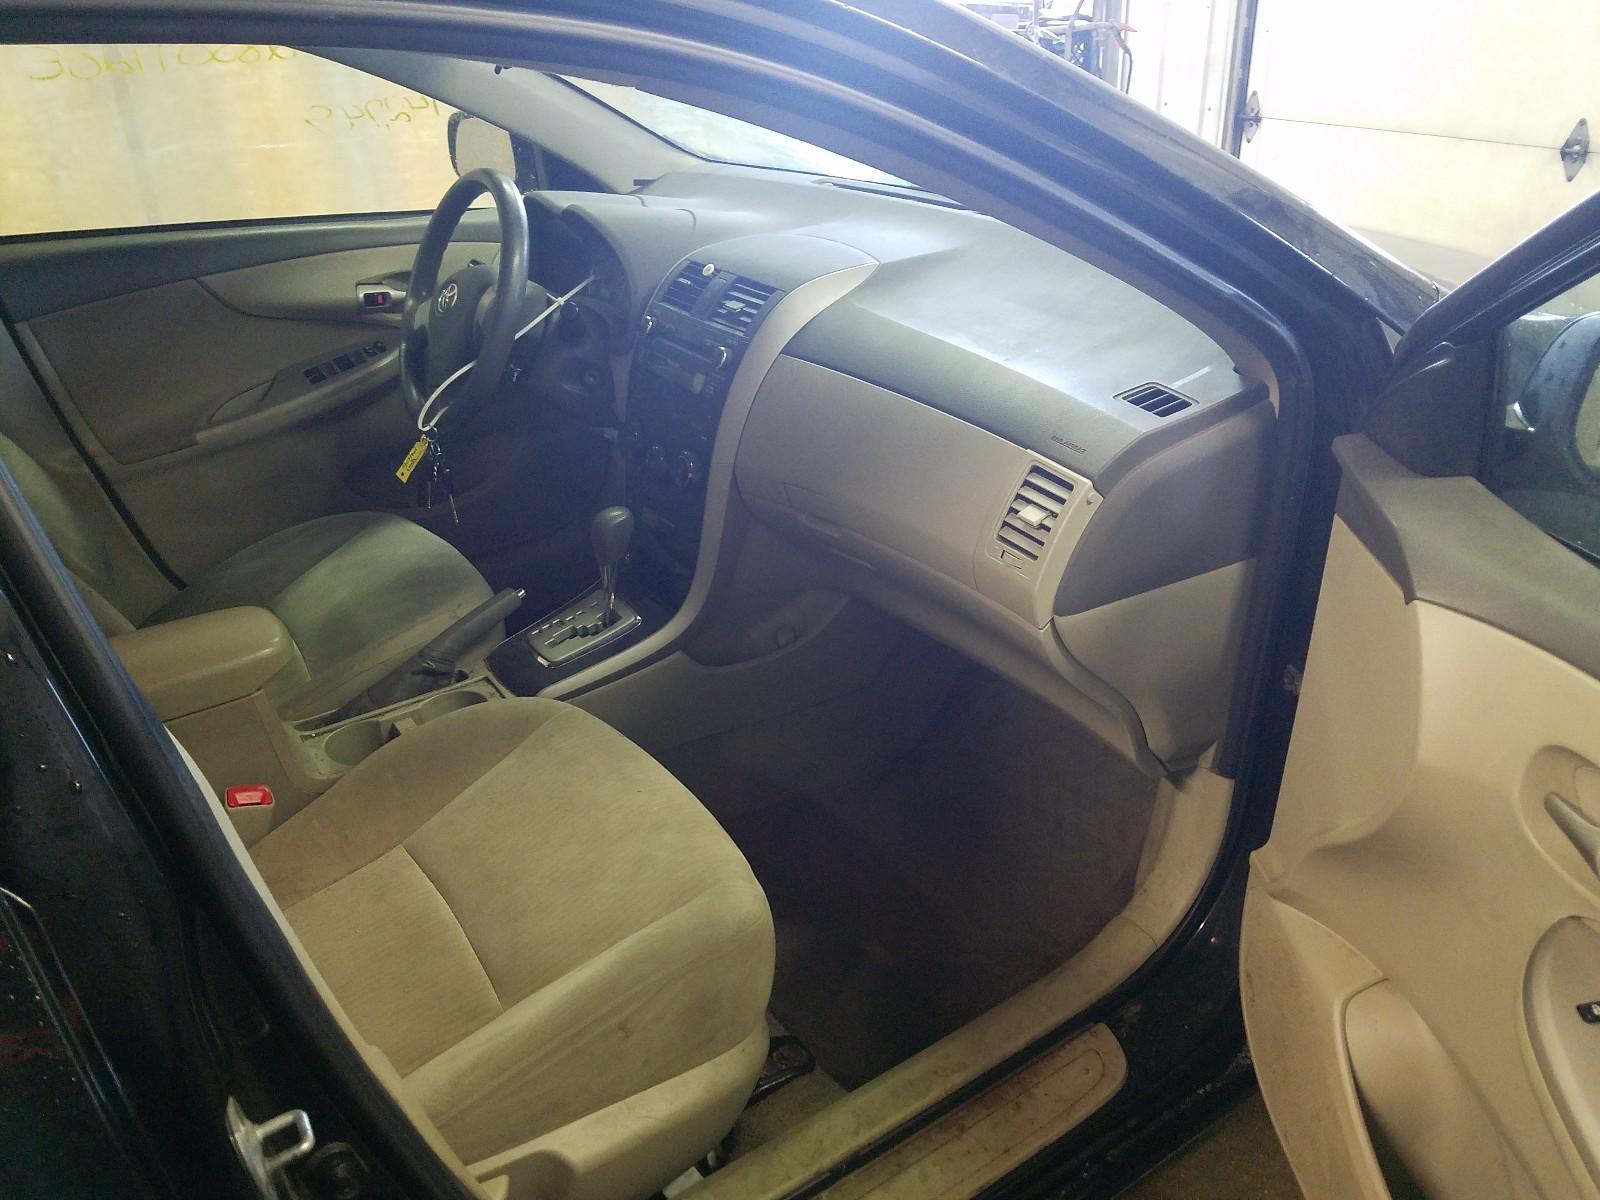 2T1BU4EE2AC420388 - 2010 Toyota Corolla Ba 1.8L close up View